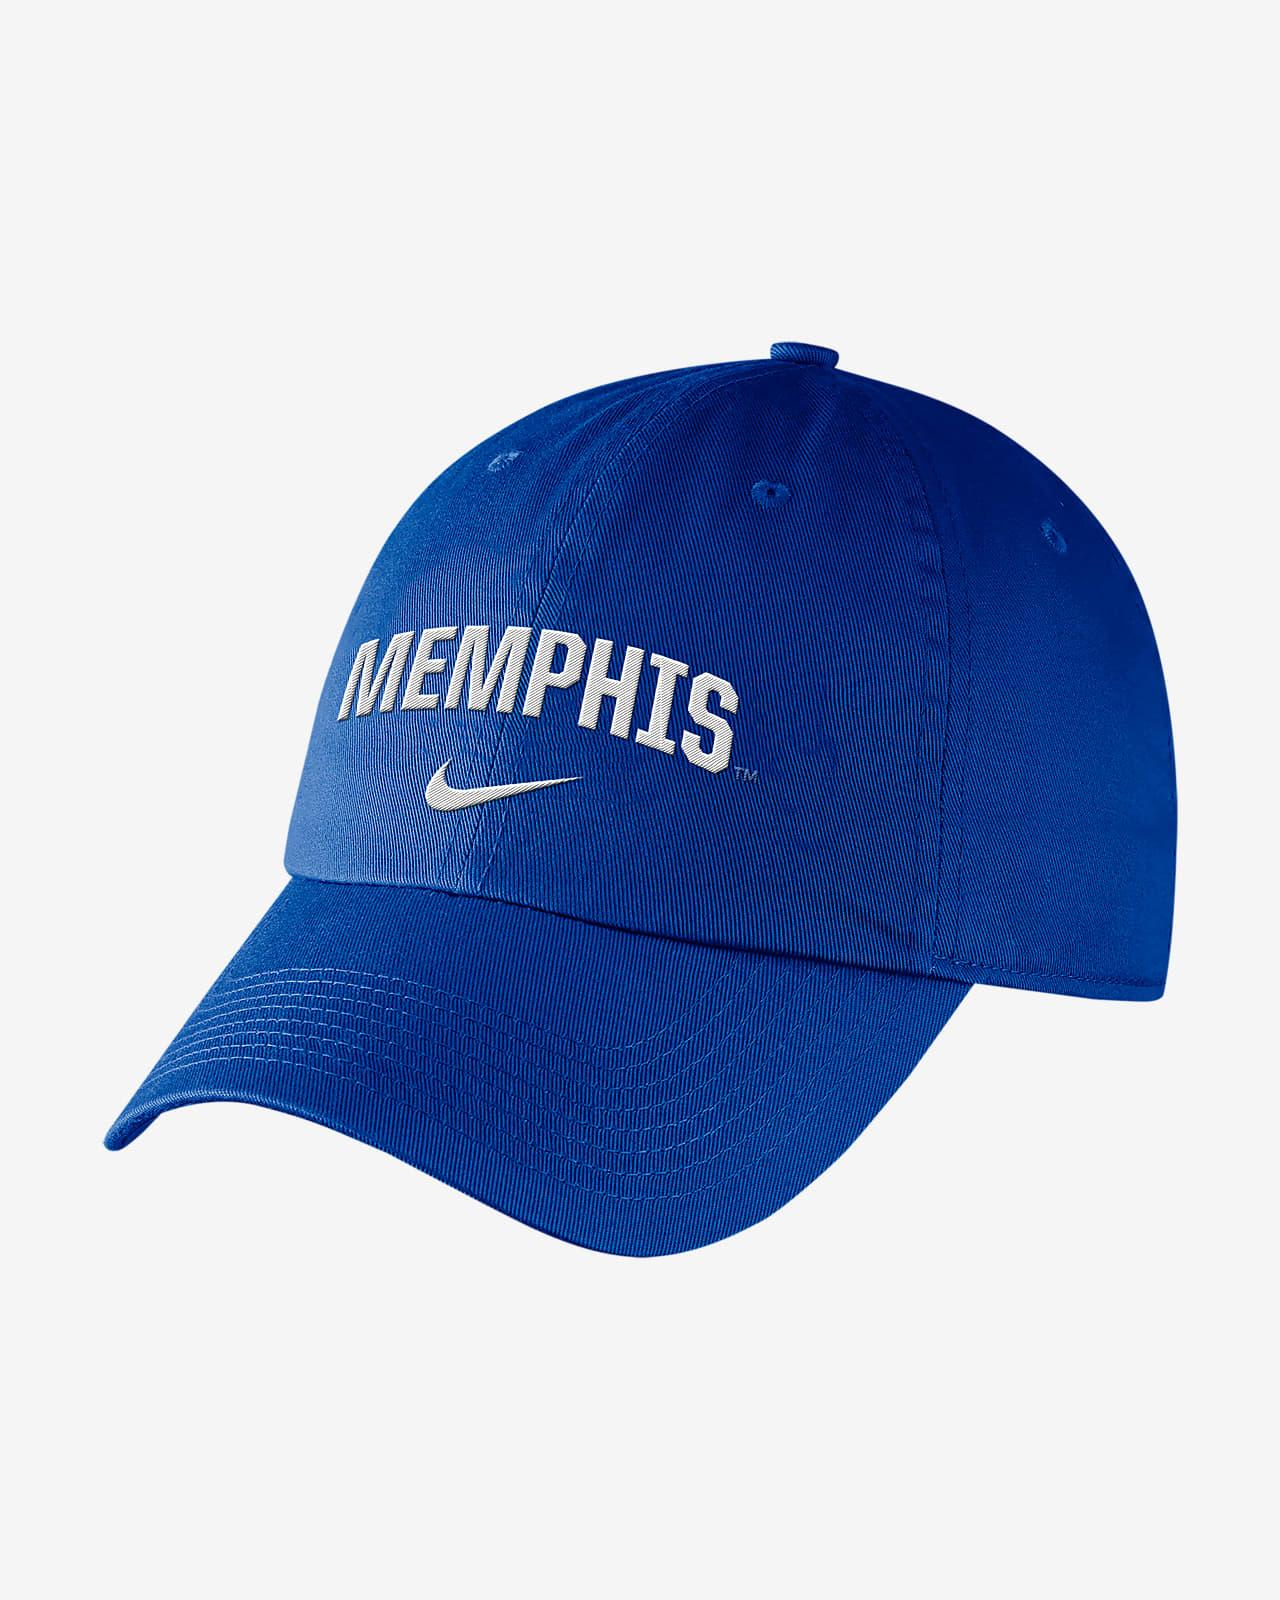 Nike College (Memphis) Hat